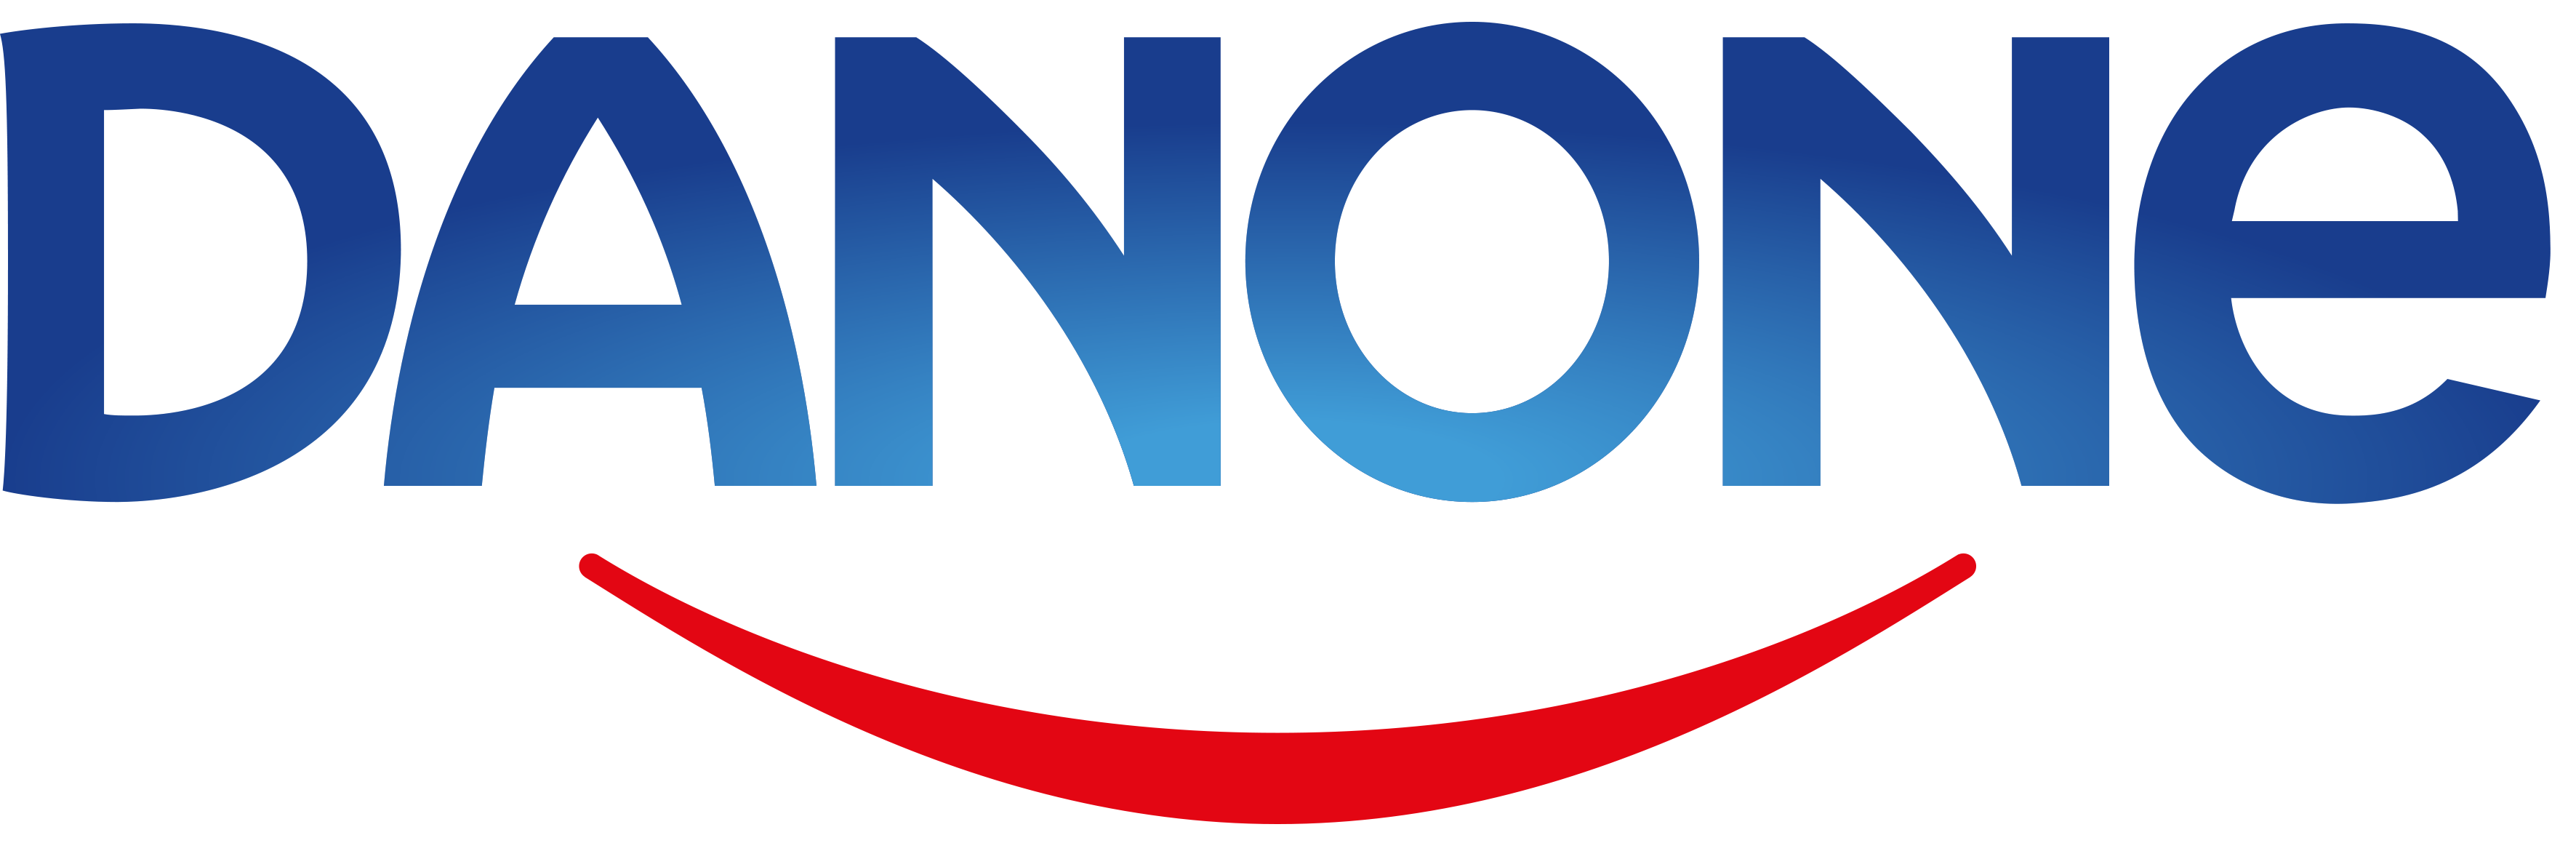 Danone BN Icon Logo